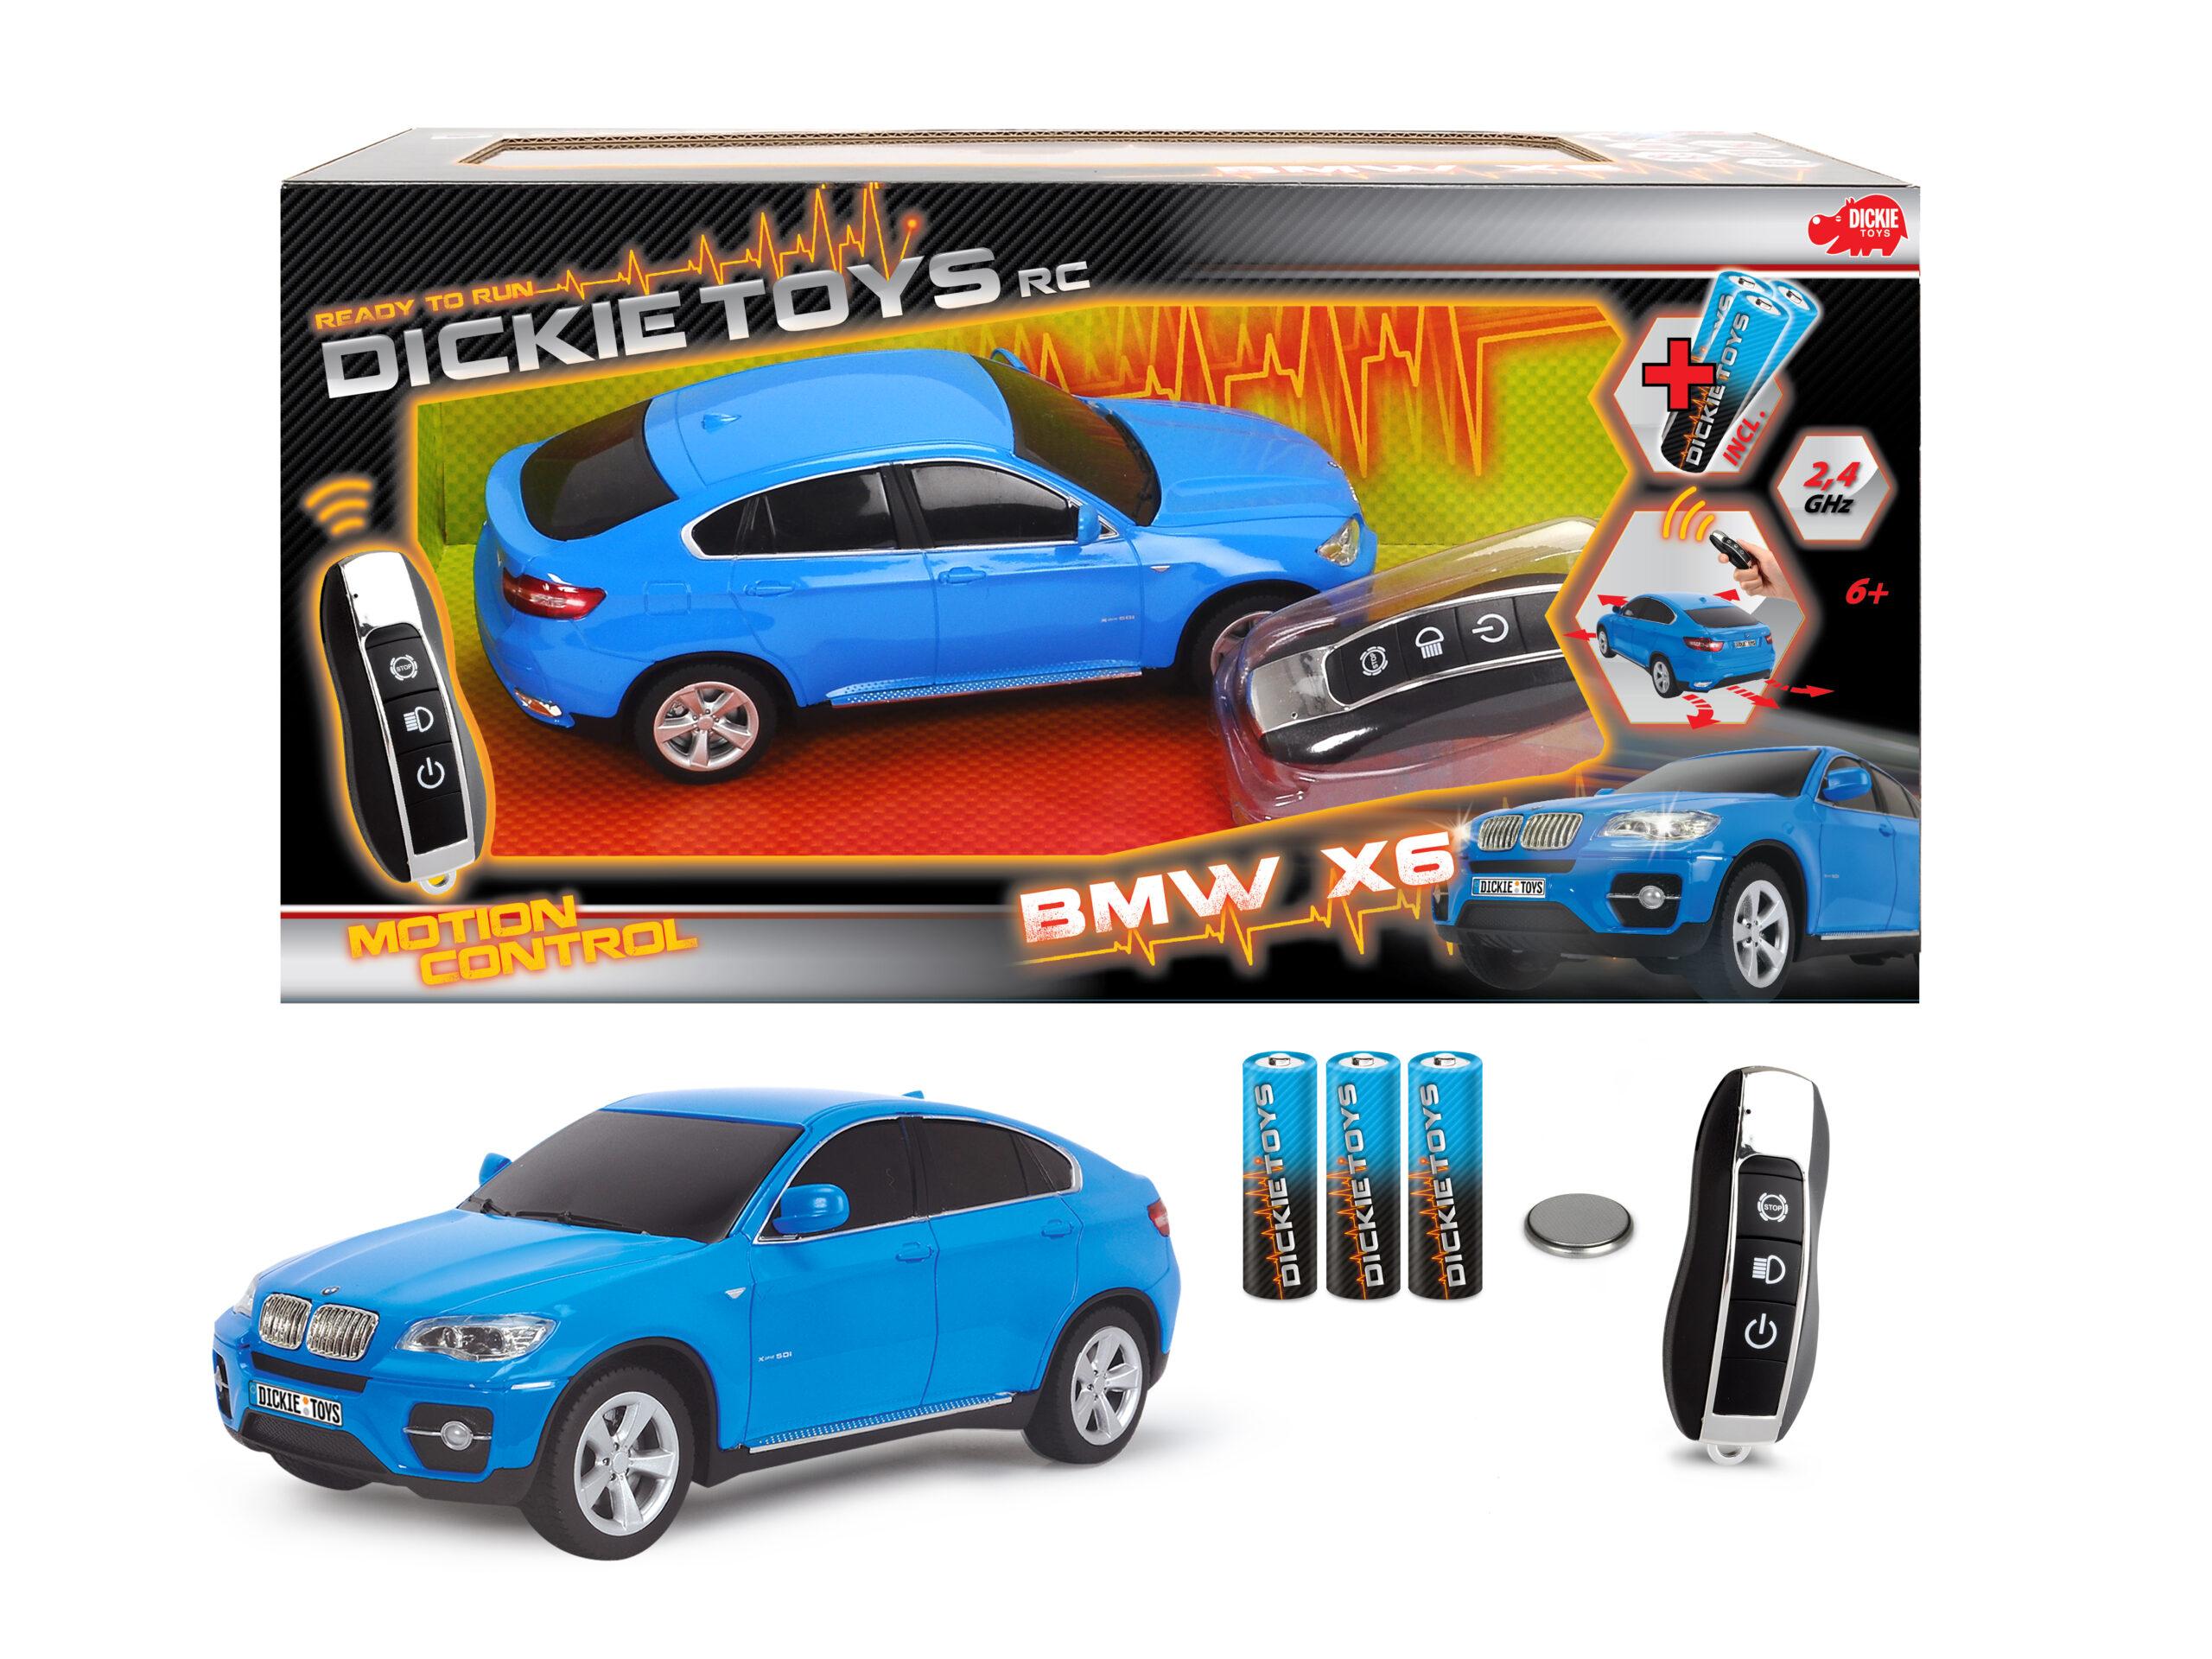 Dickie - R/C Motion Control Bmw X6 - 201119106